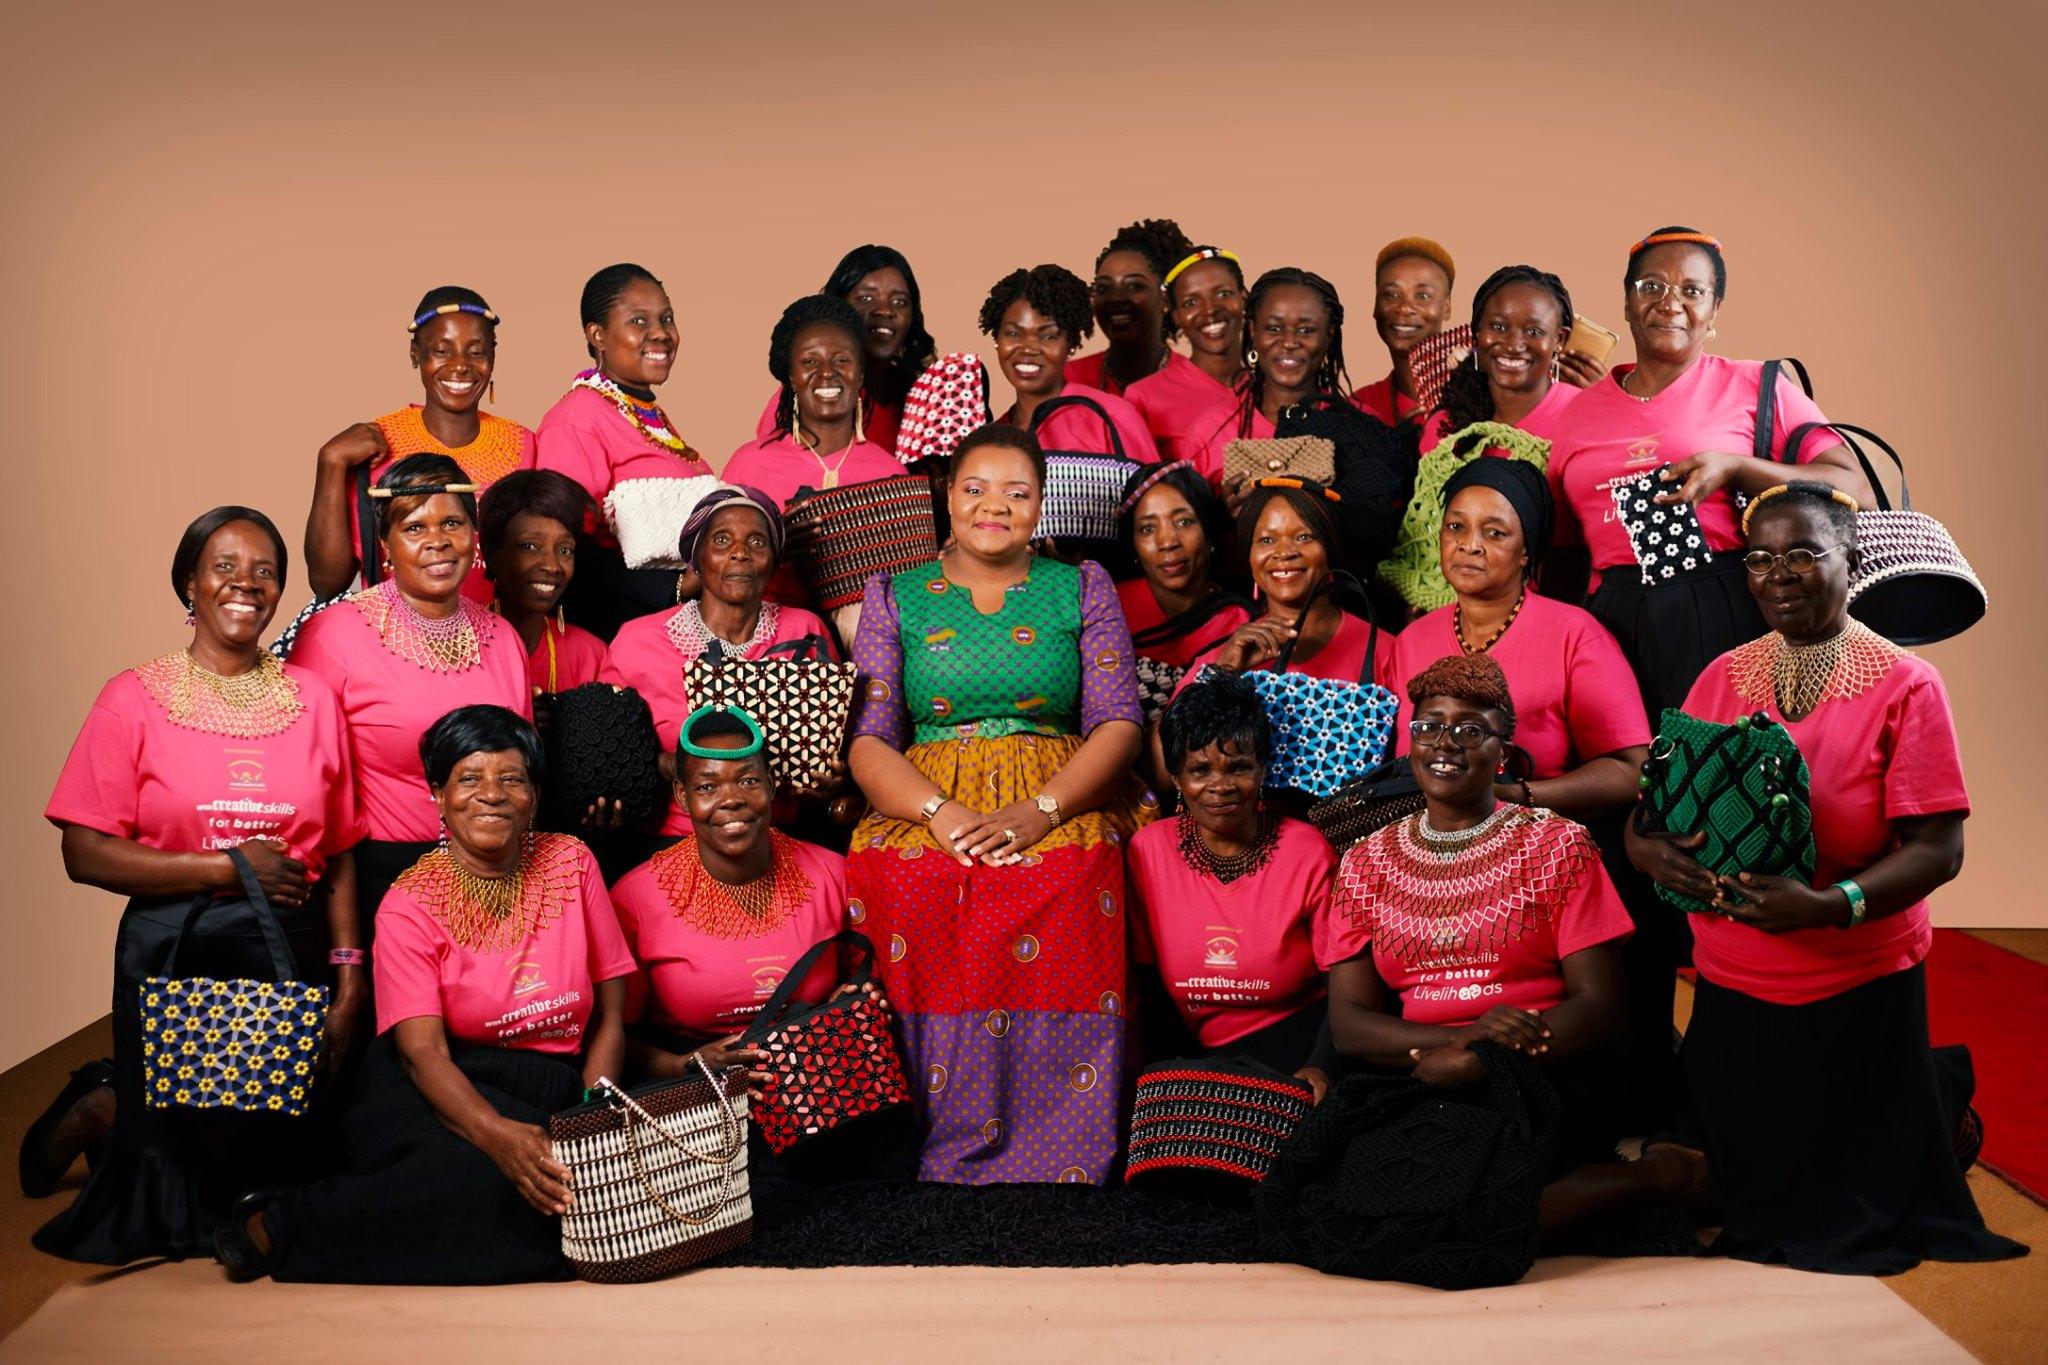 #AFCSkillsTrainingProgram Empowering Women